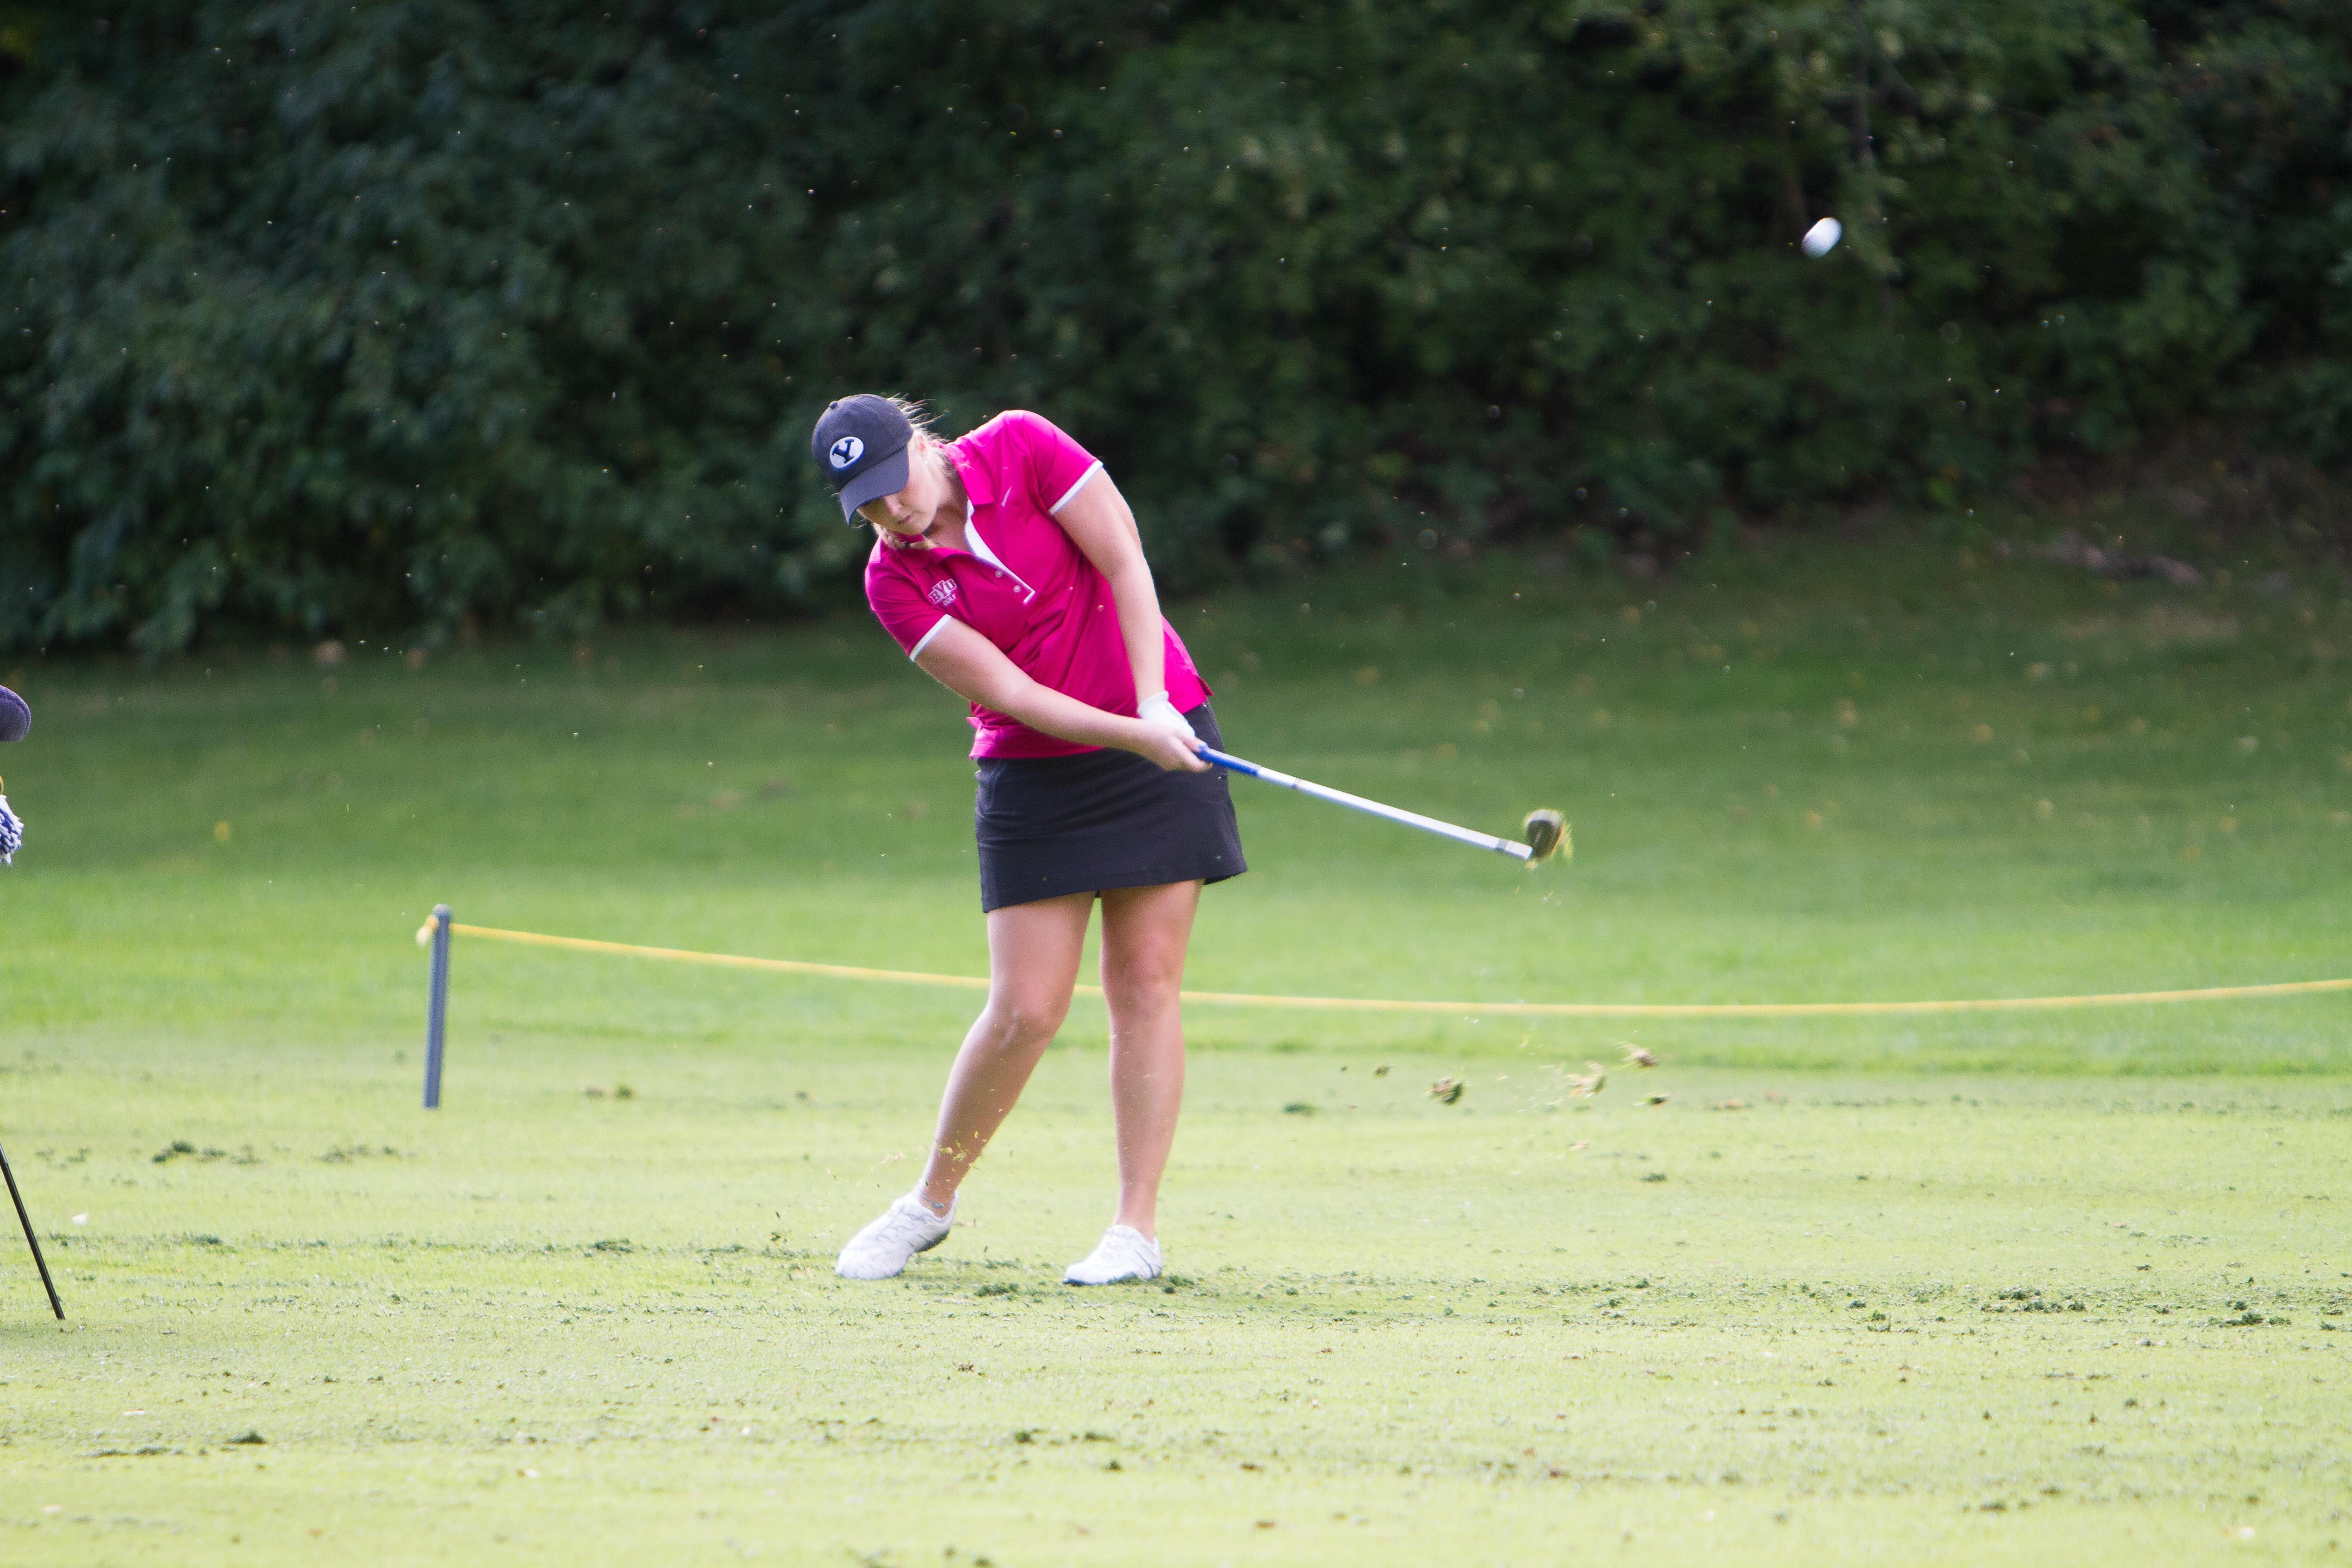 Lea Garner hits a shot during the Hobble Creek Tournament in 2013. (Sarah Hill)